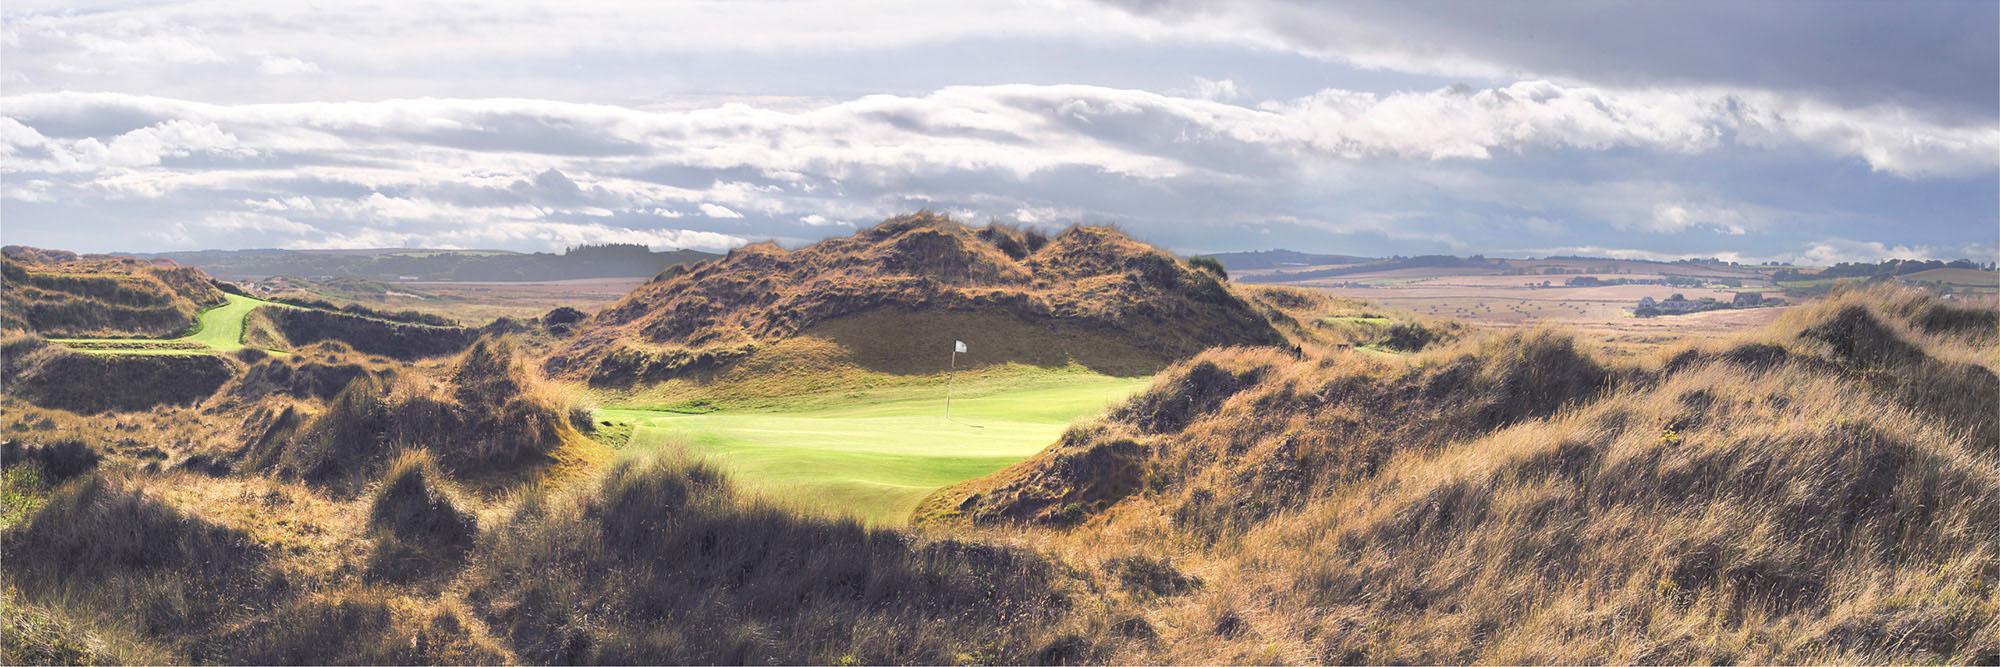 Golf Course Image - Trump International No. 6